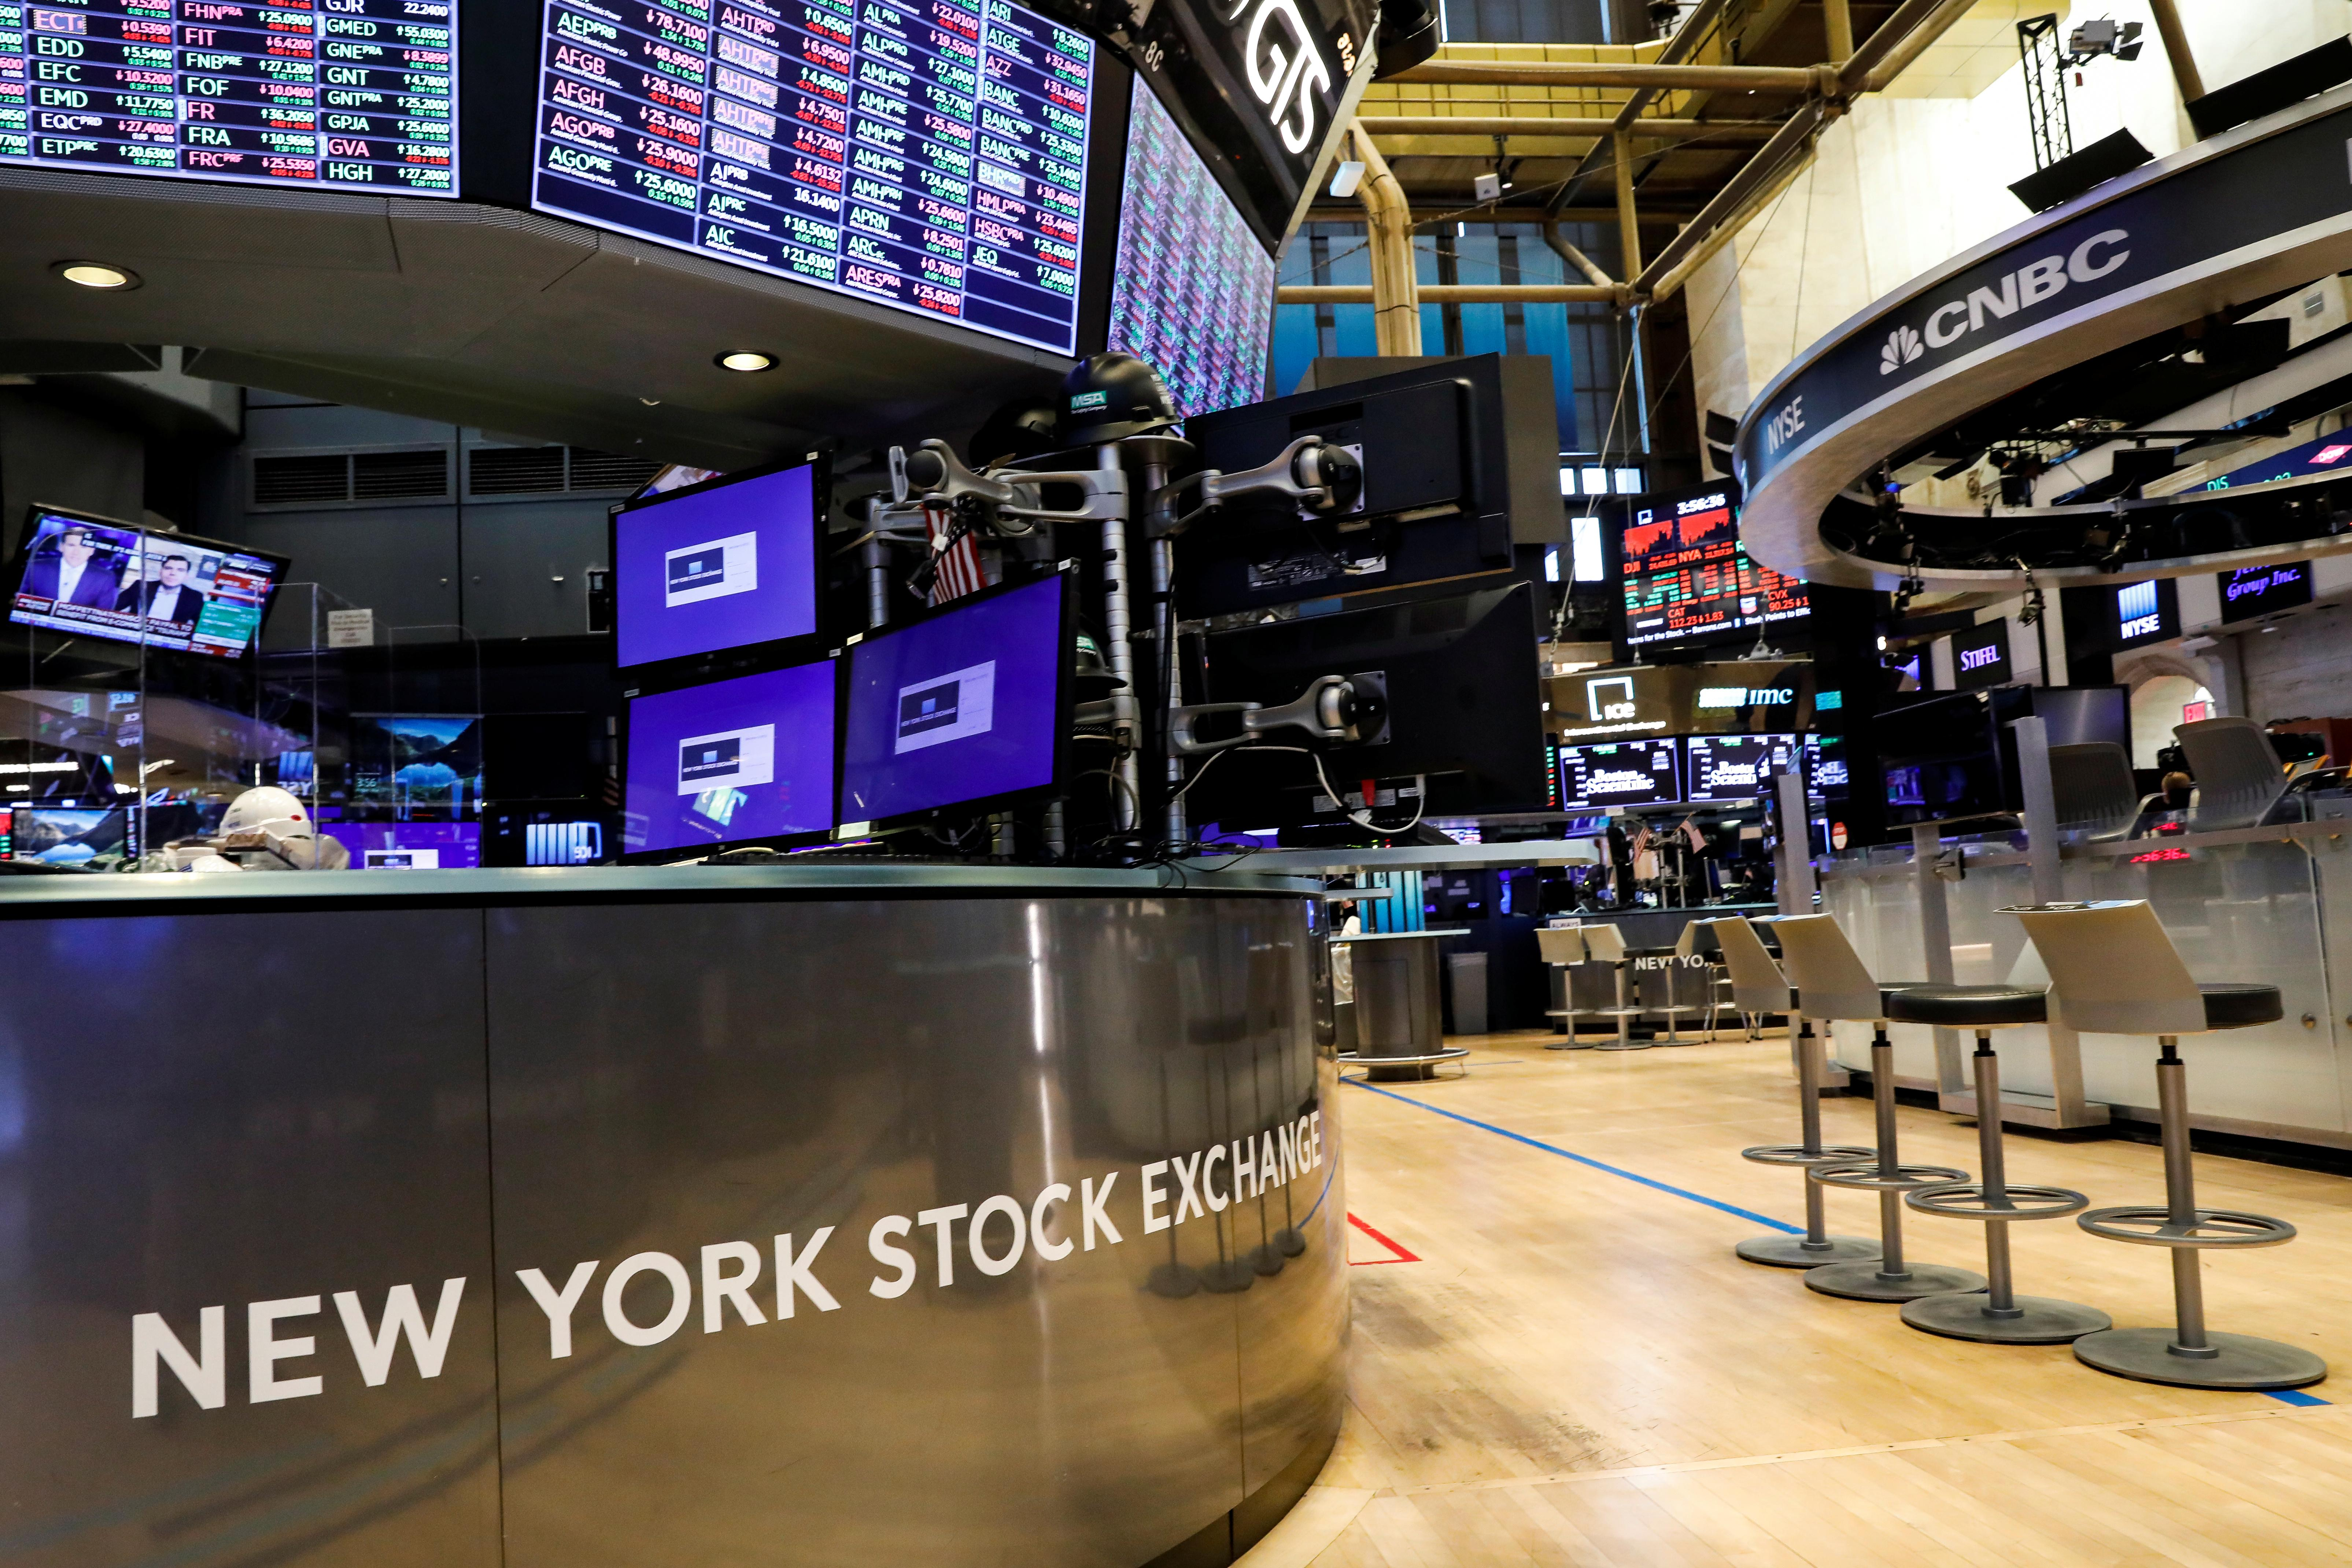 Wall Street Week Ahead: Investors look beyond drug makers as hunt for COVID-19 treatment heats up 1